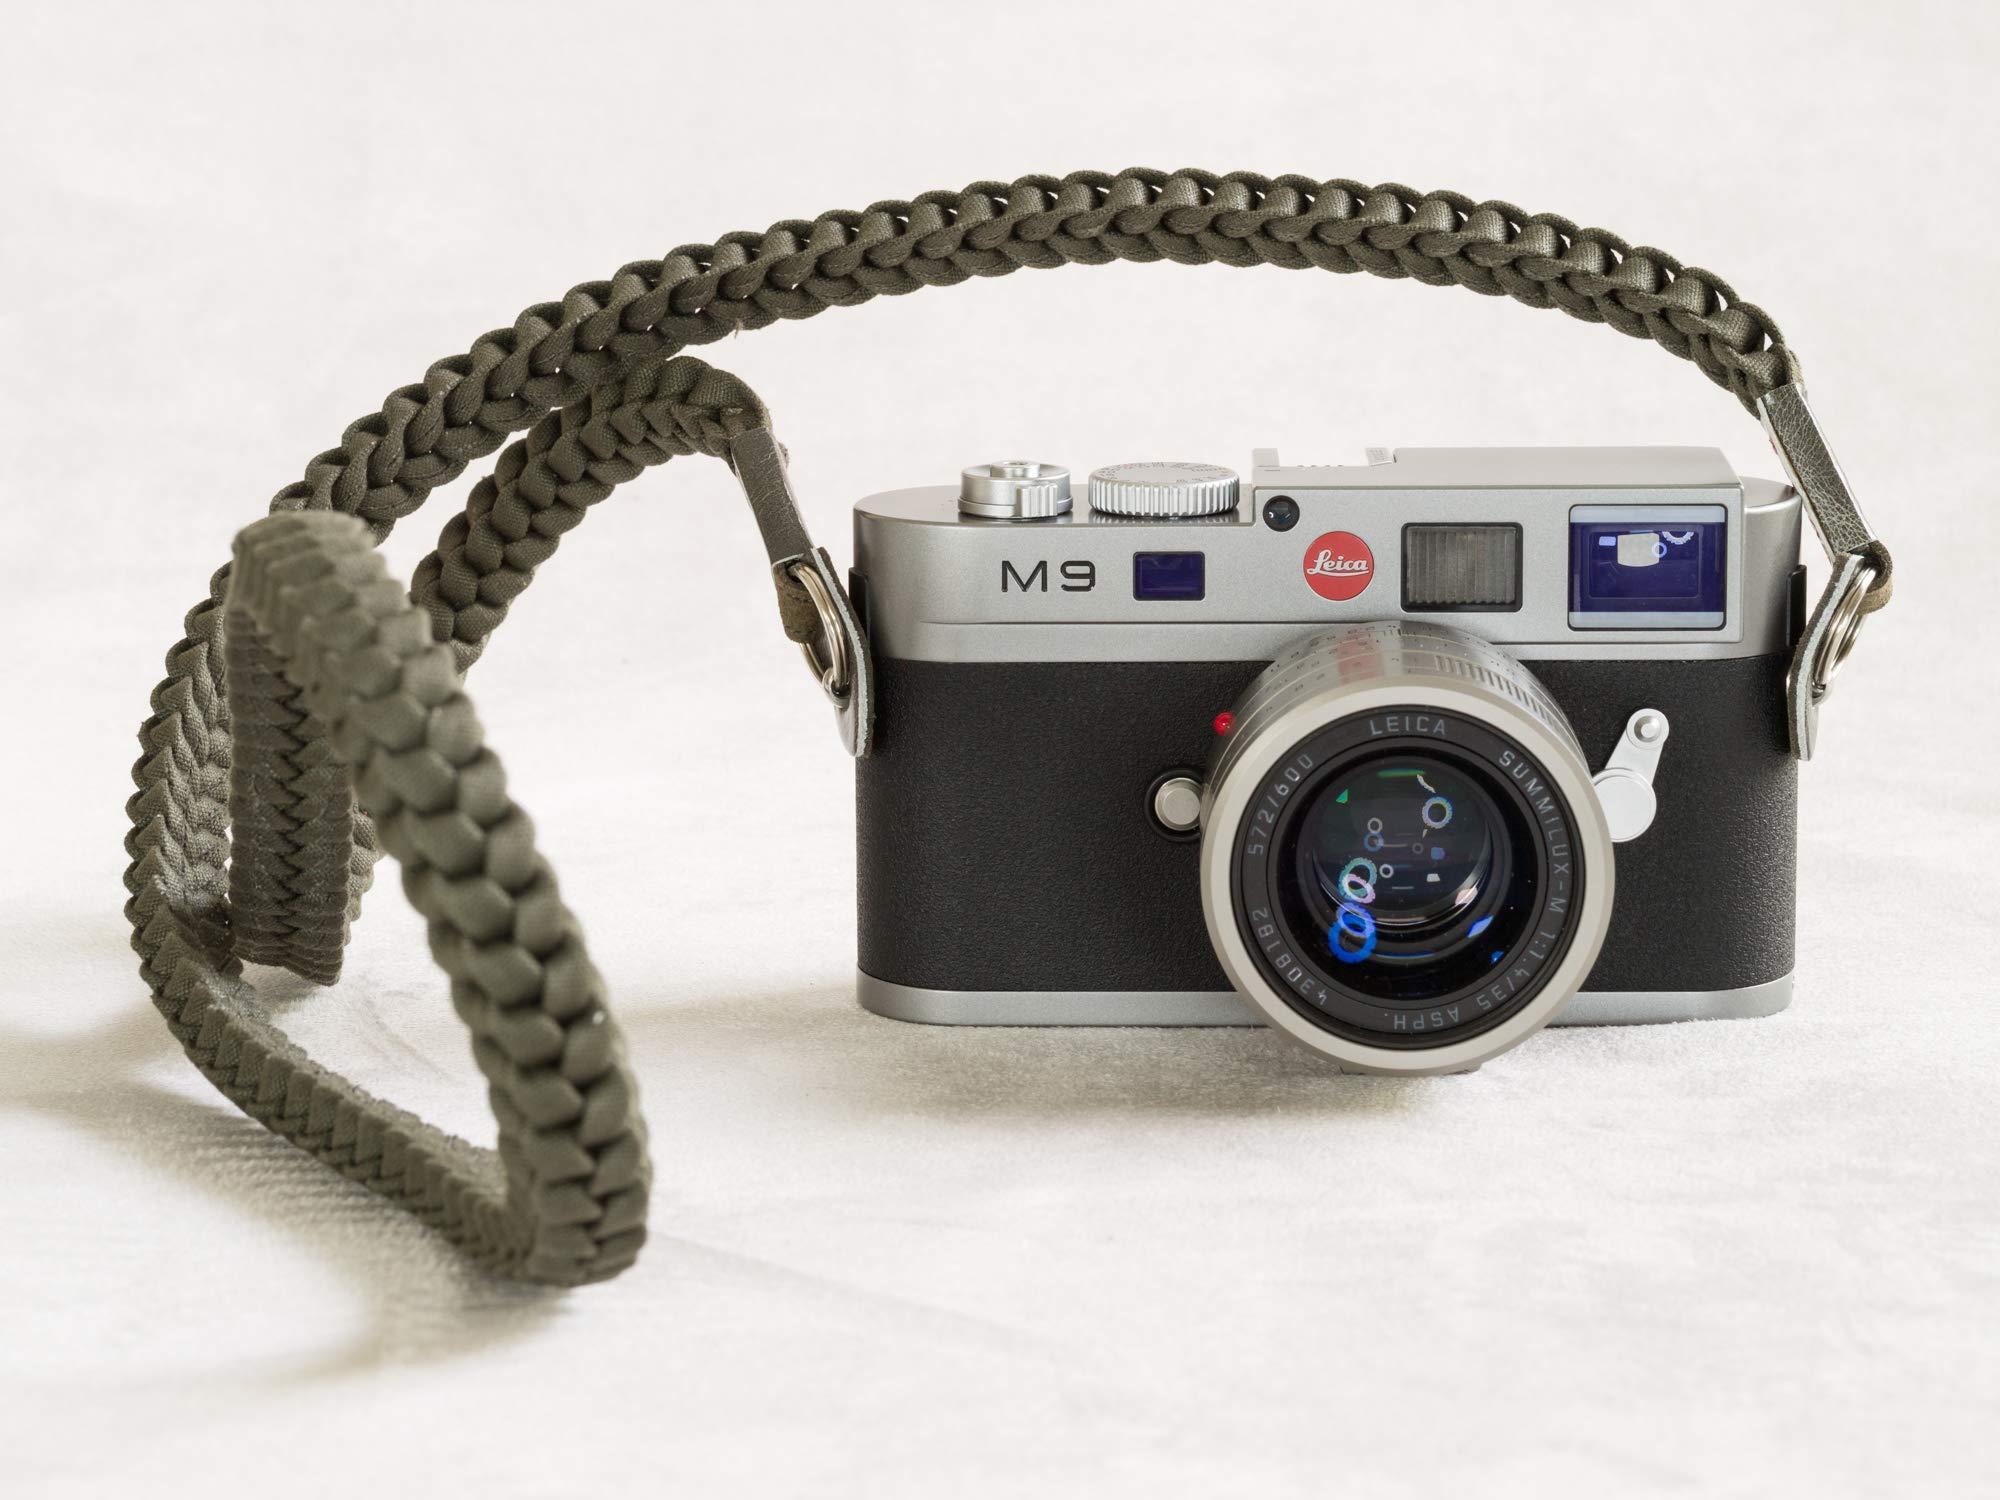 Barton 1972 Designer Braided Muddy Green Military Camera Neck Strap Lint Free Cotton 42'' Long w/Carry Bag Leica Sony Fuji Olympus Nikon by Barton 1972 (Image #2)